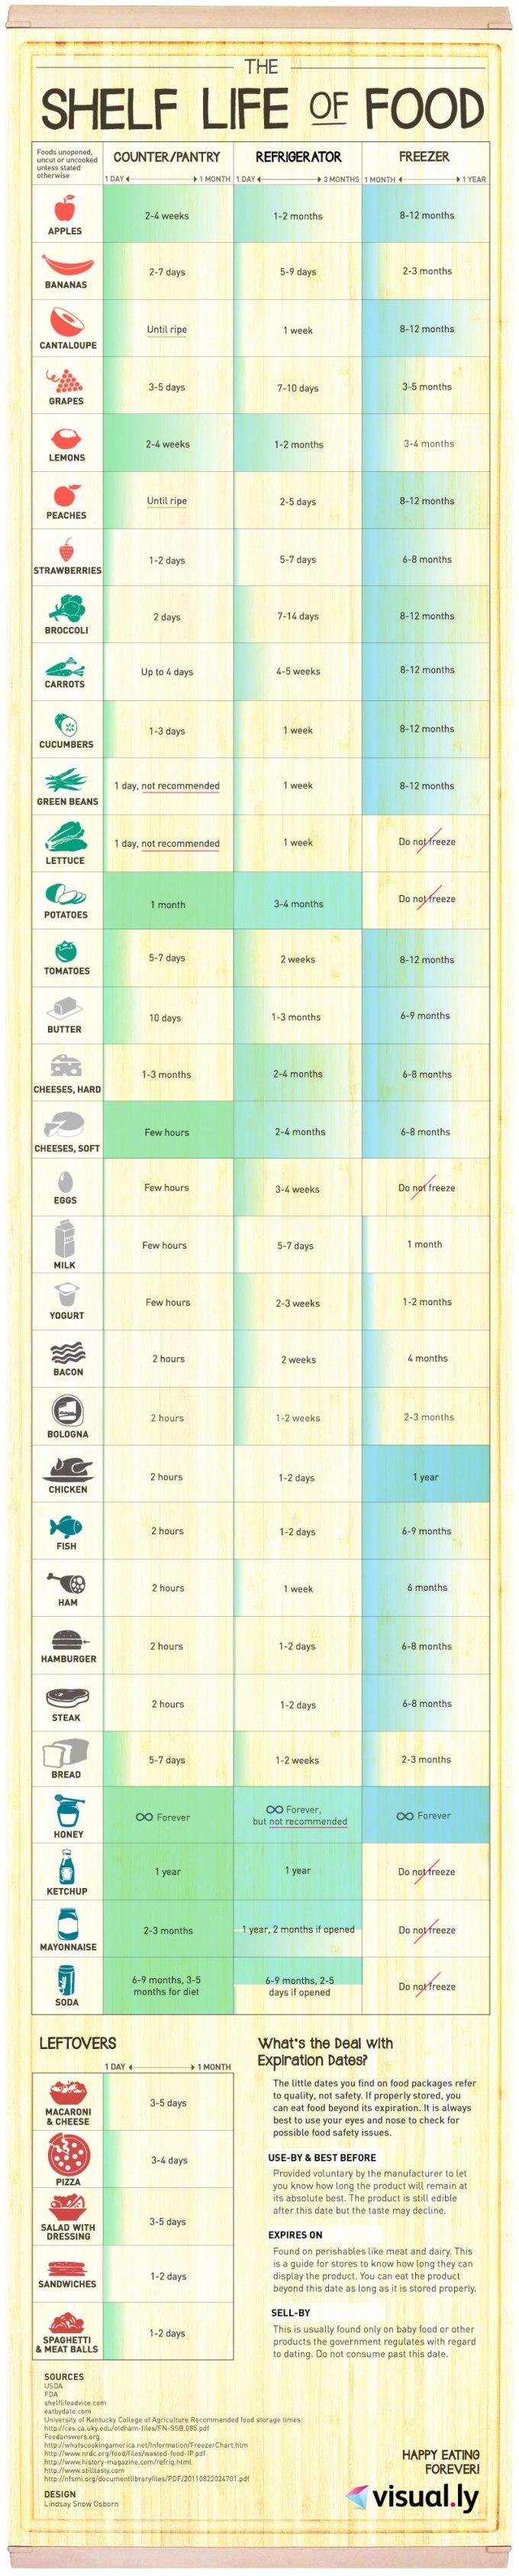 shelf-life-of-food-infographic